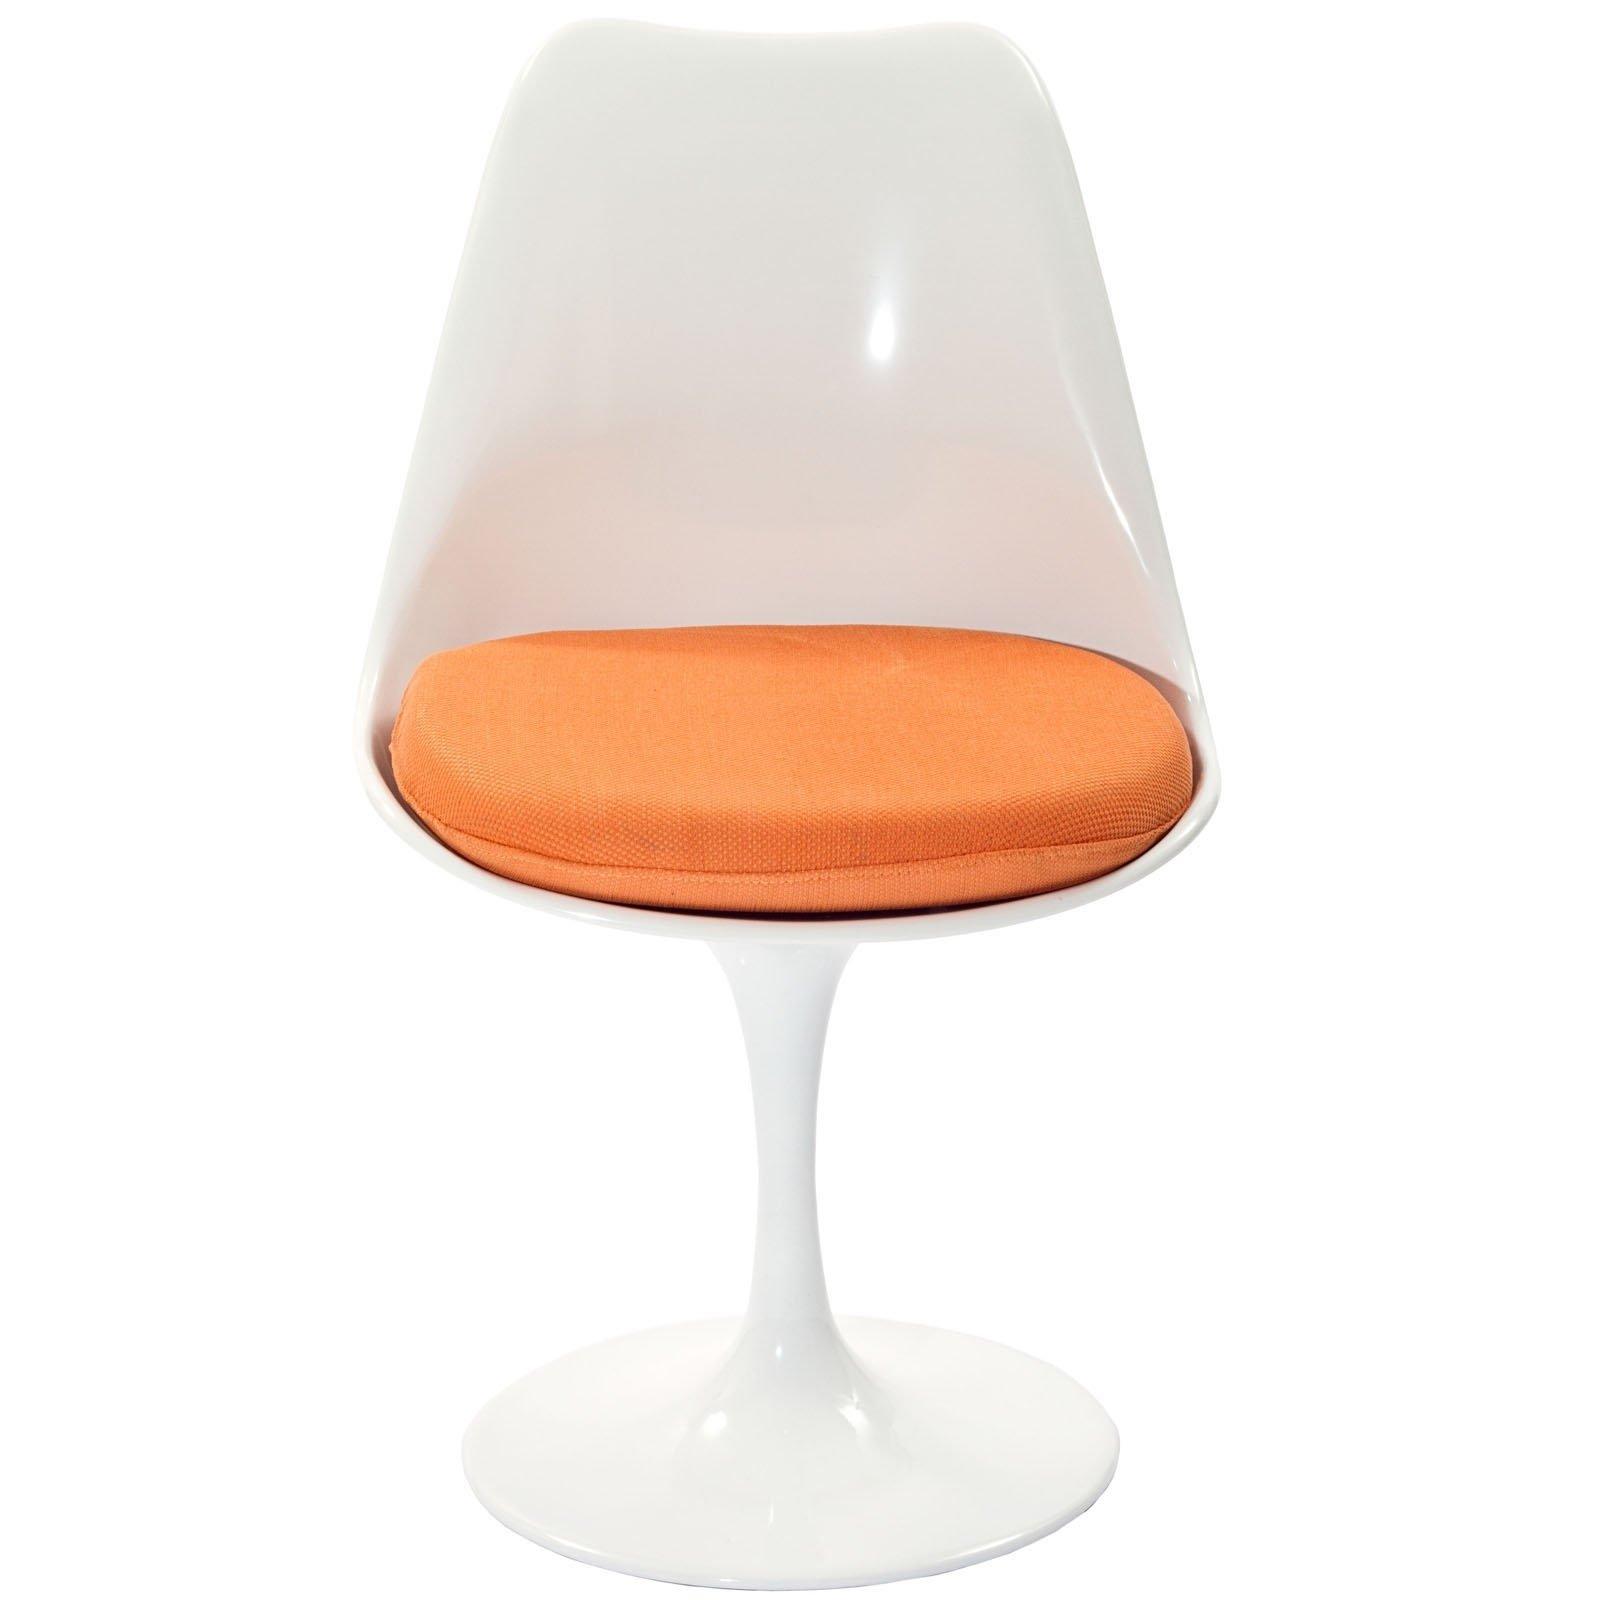 LexMod Eero Saarinen Style Tulip Side Chair with Orange Cushion